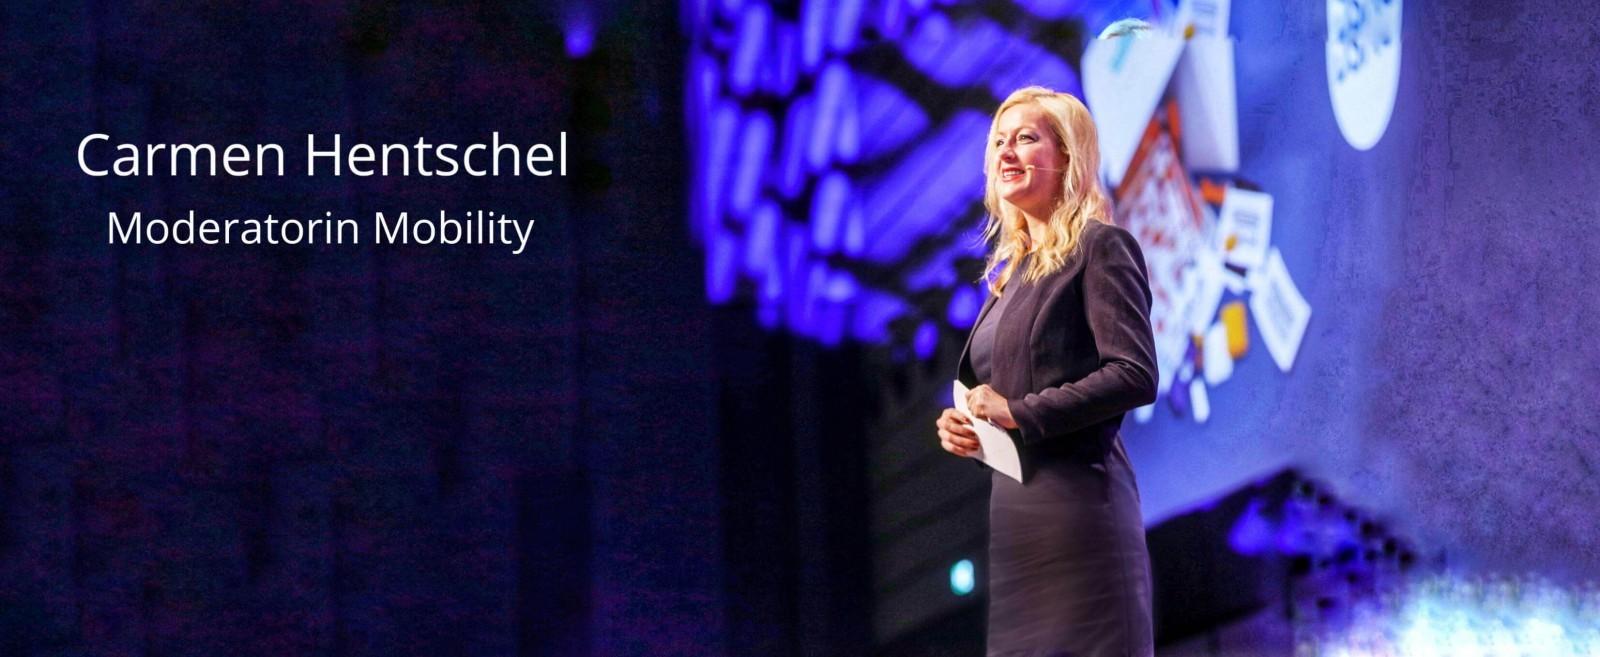 Moderatorin New Mobility Carmen Hentschel